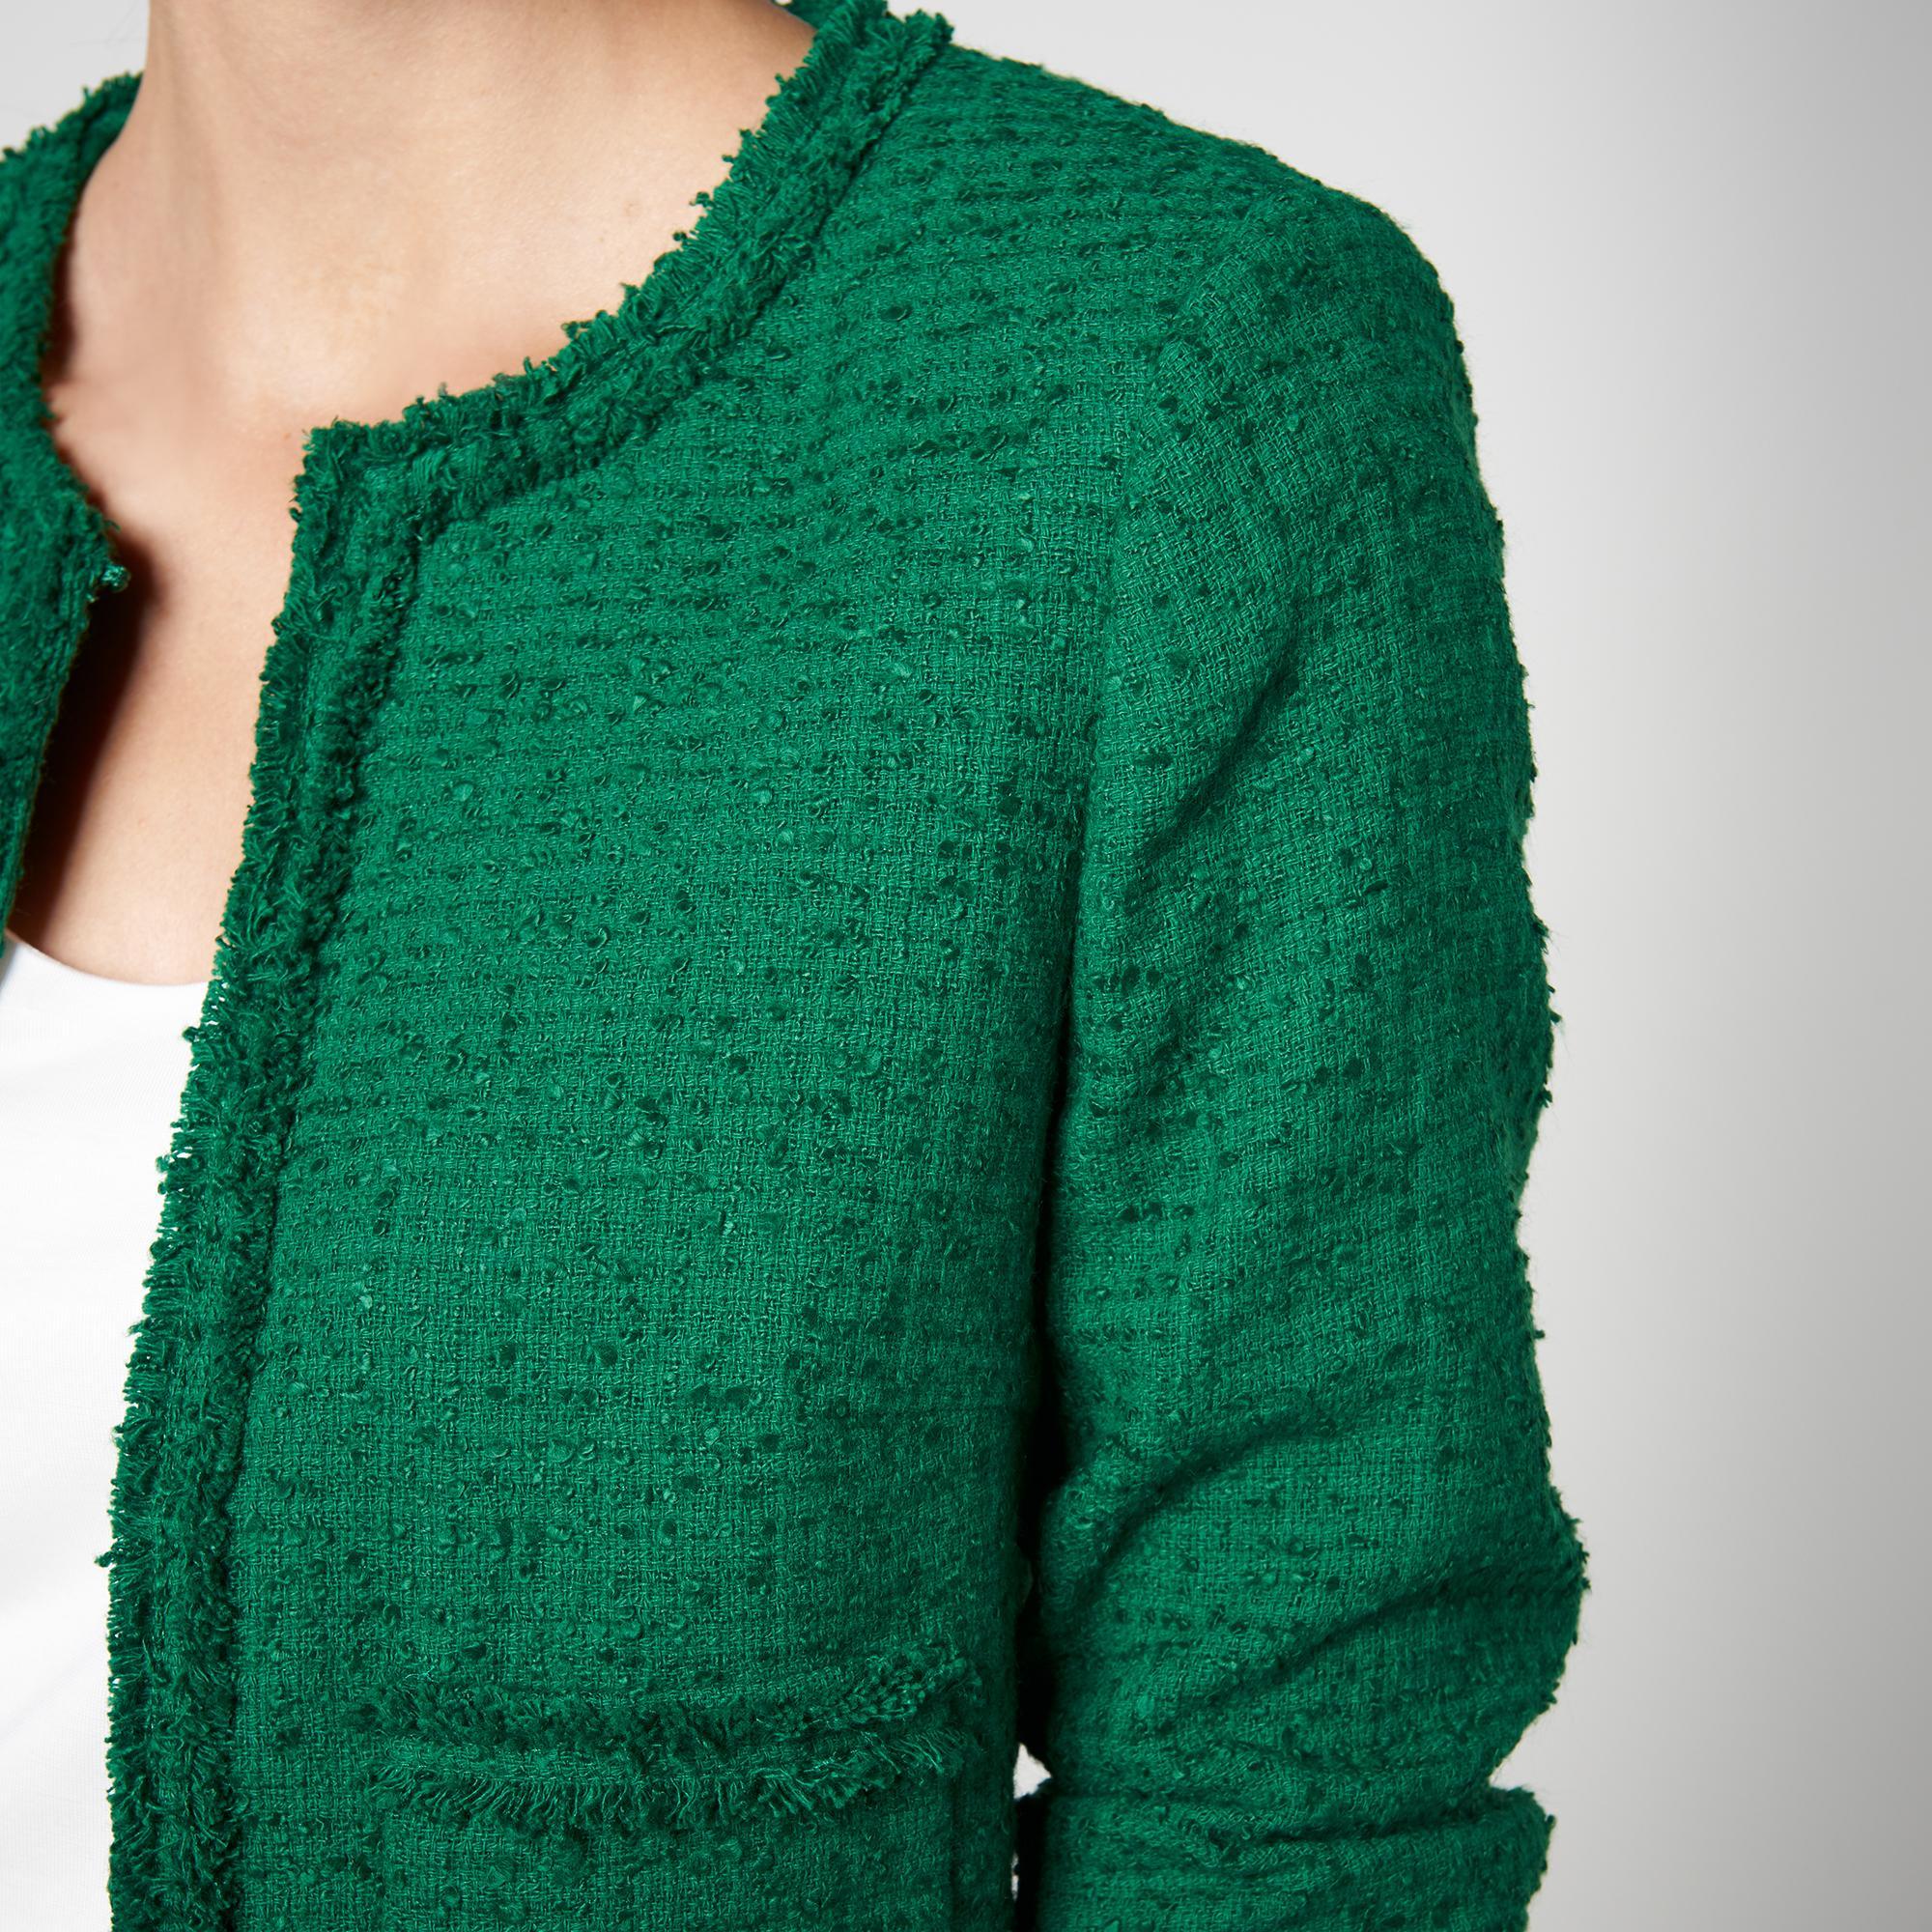 Charles Green Tweed Jacket by L.K.Bennett